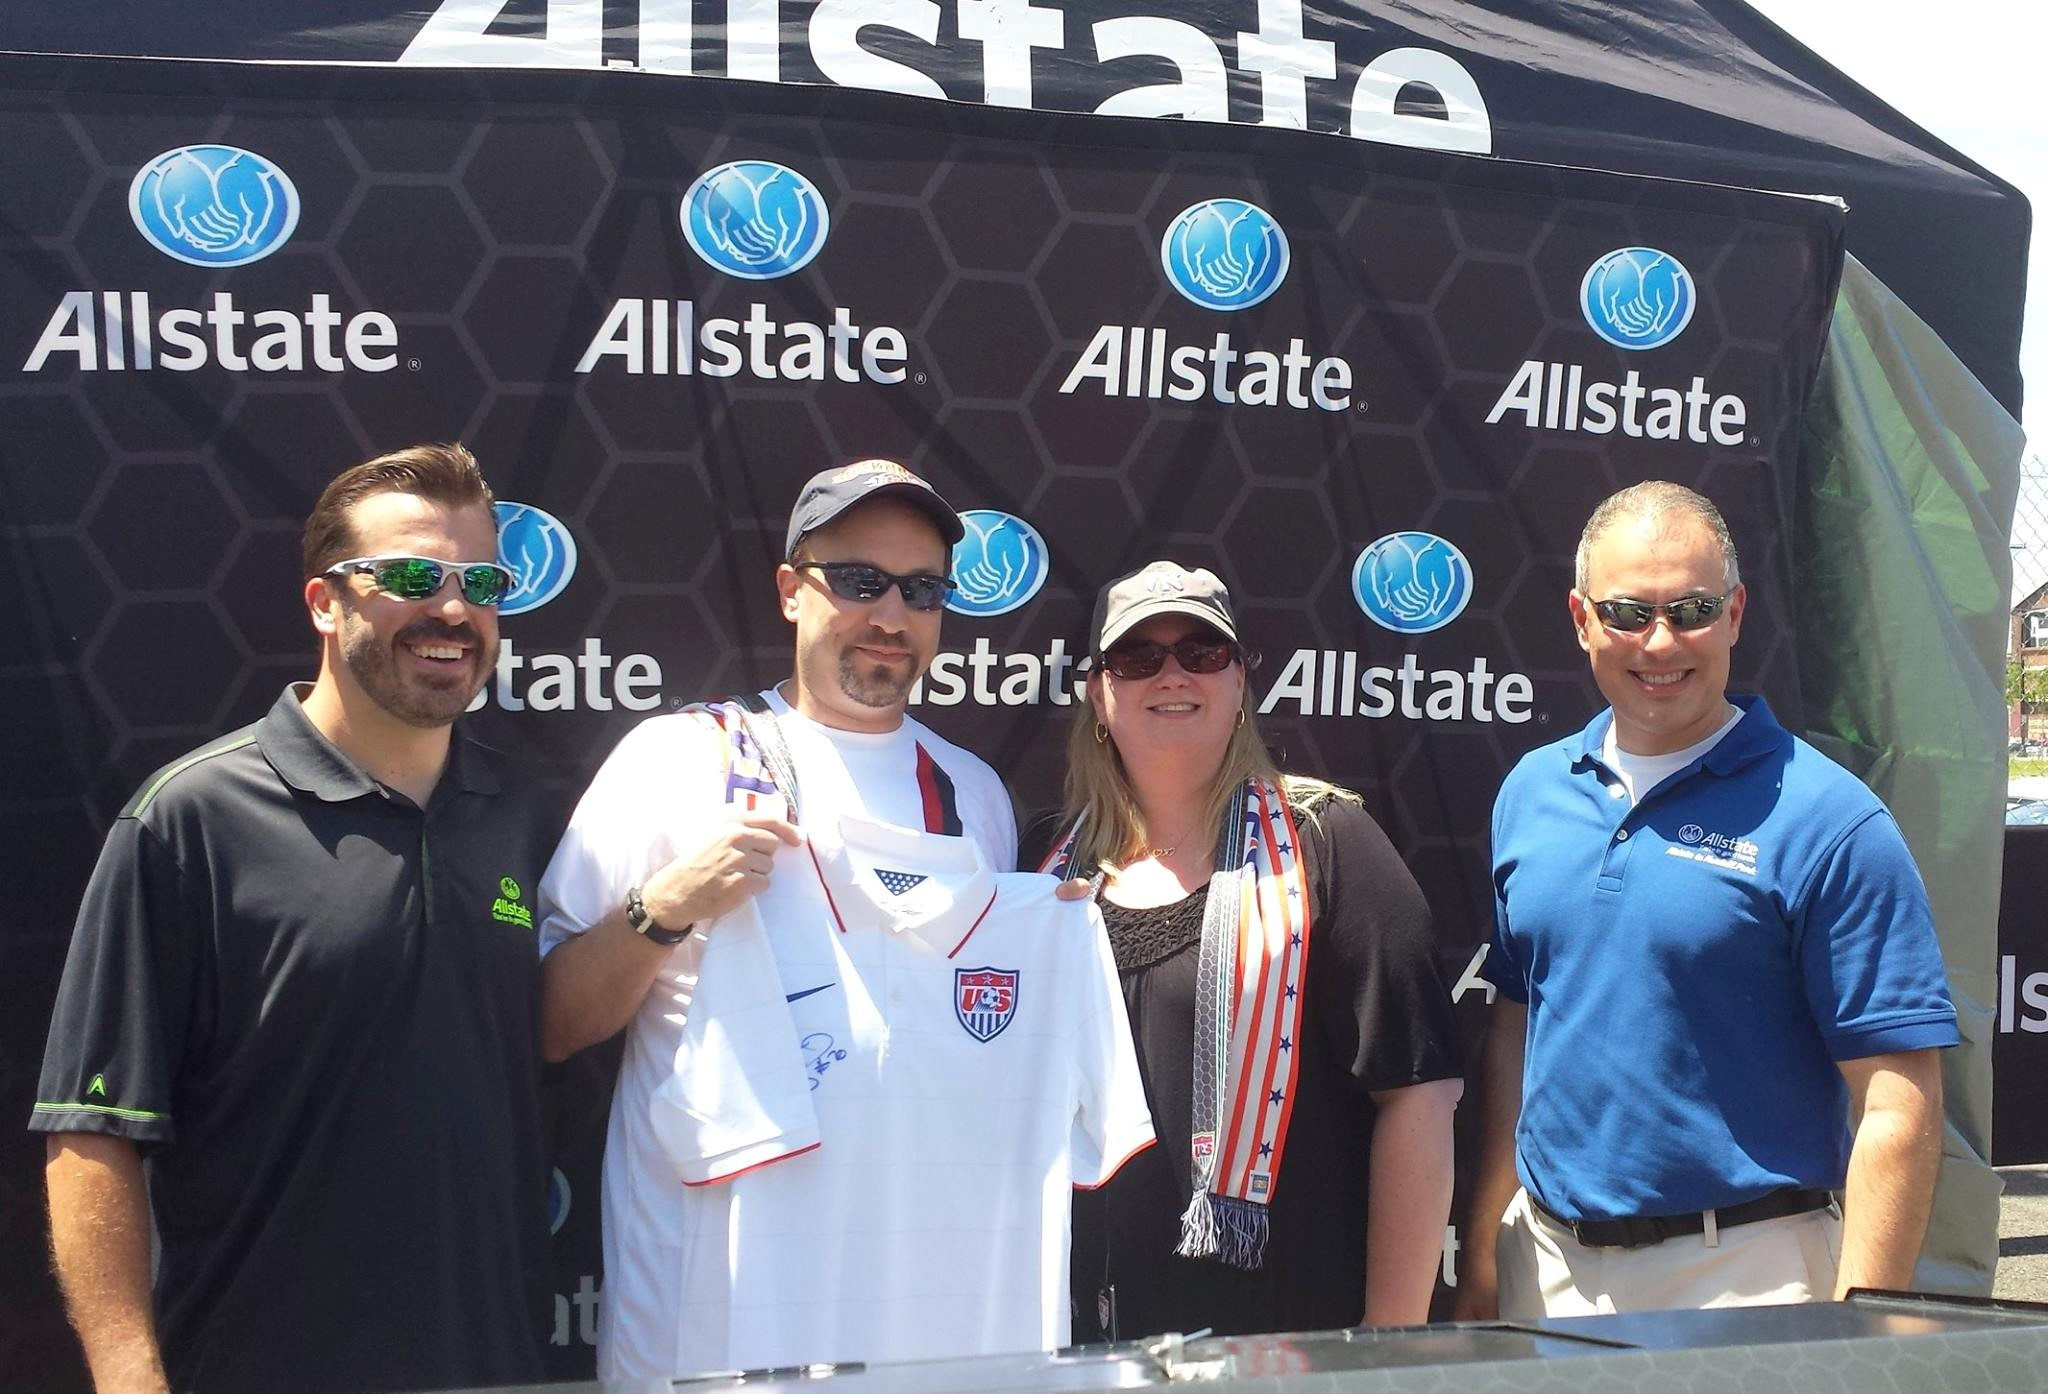 David Basile: Allstate Insurance image 15